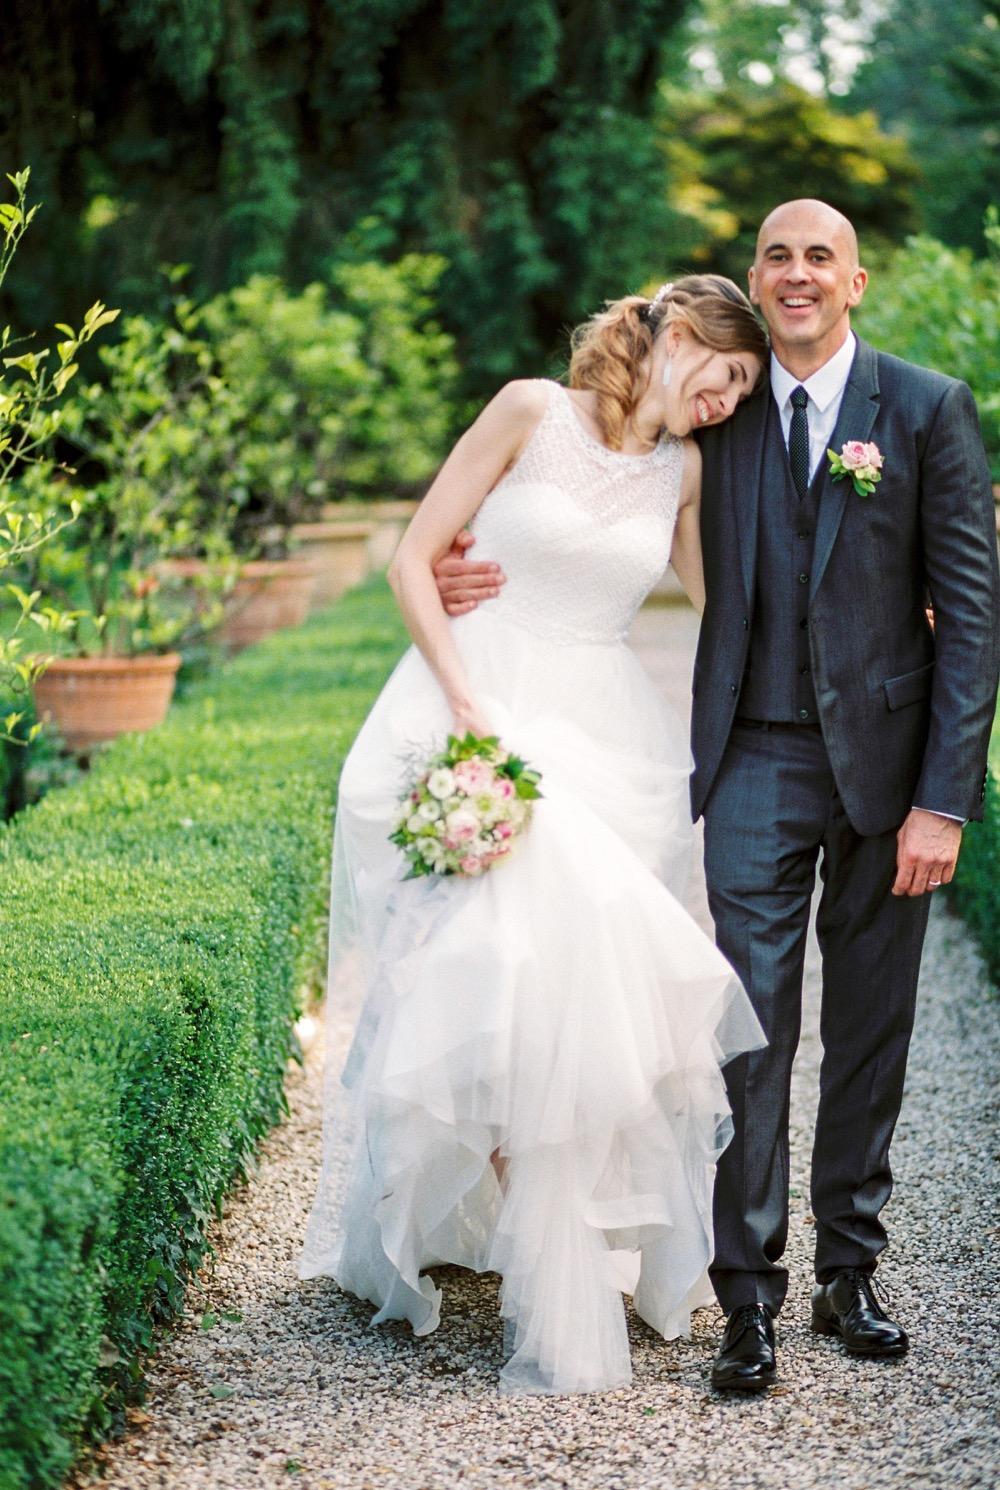 darya kamalova thecablookfotolab fine art film fhotographer in italy destination wedding como lake villa regina teodolinda villa pisani scalabrin-316